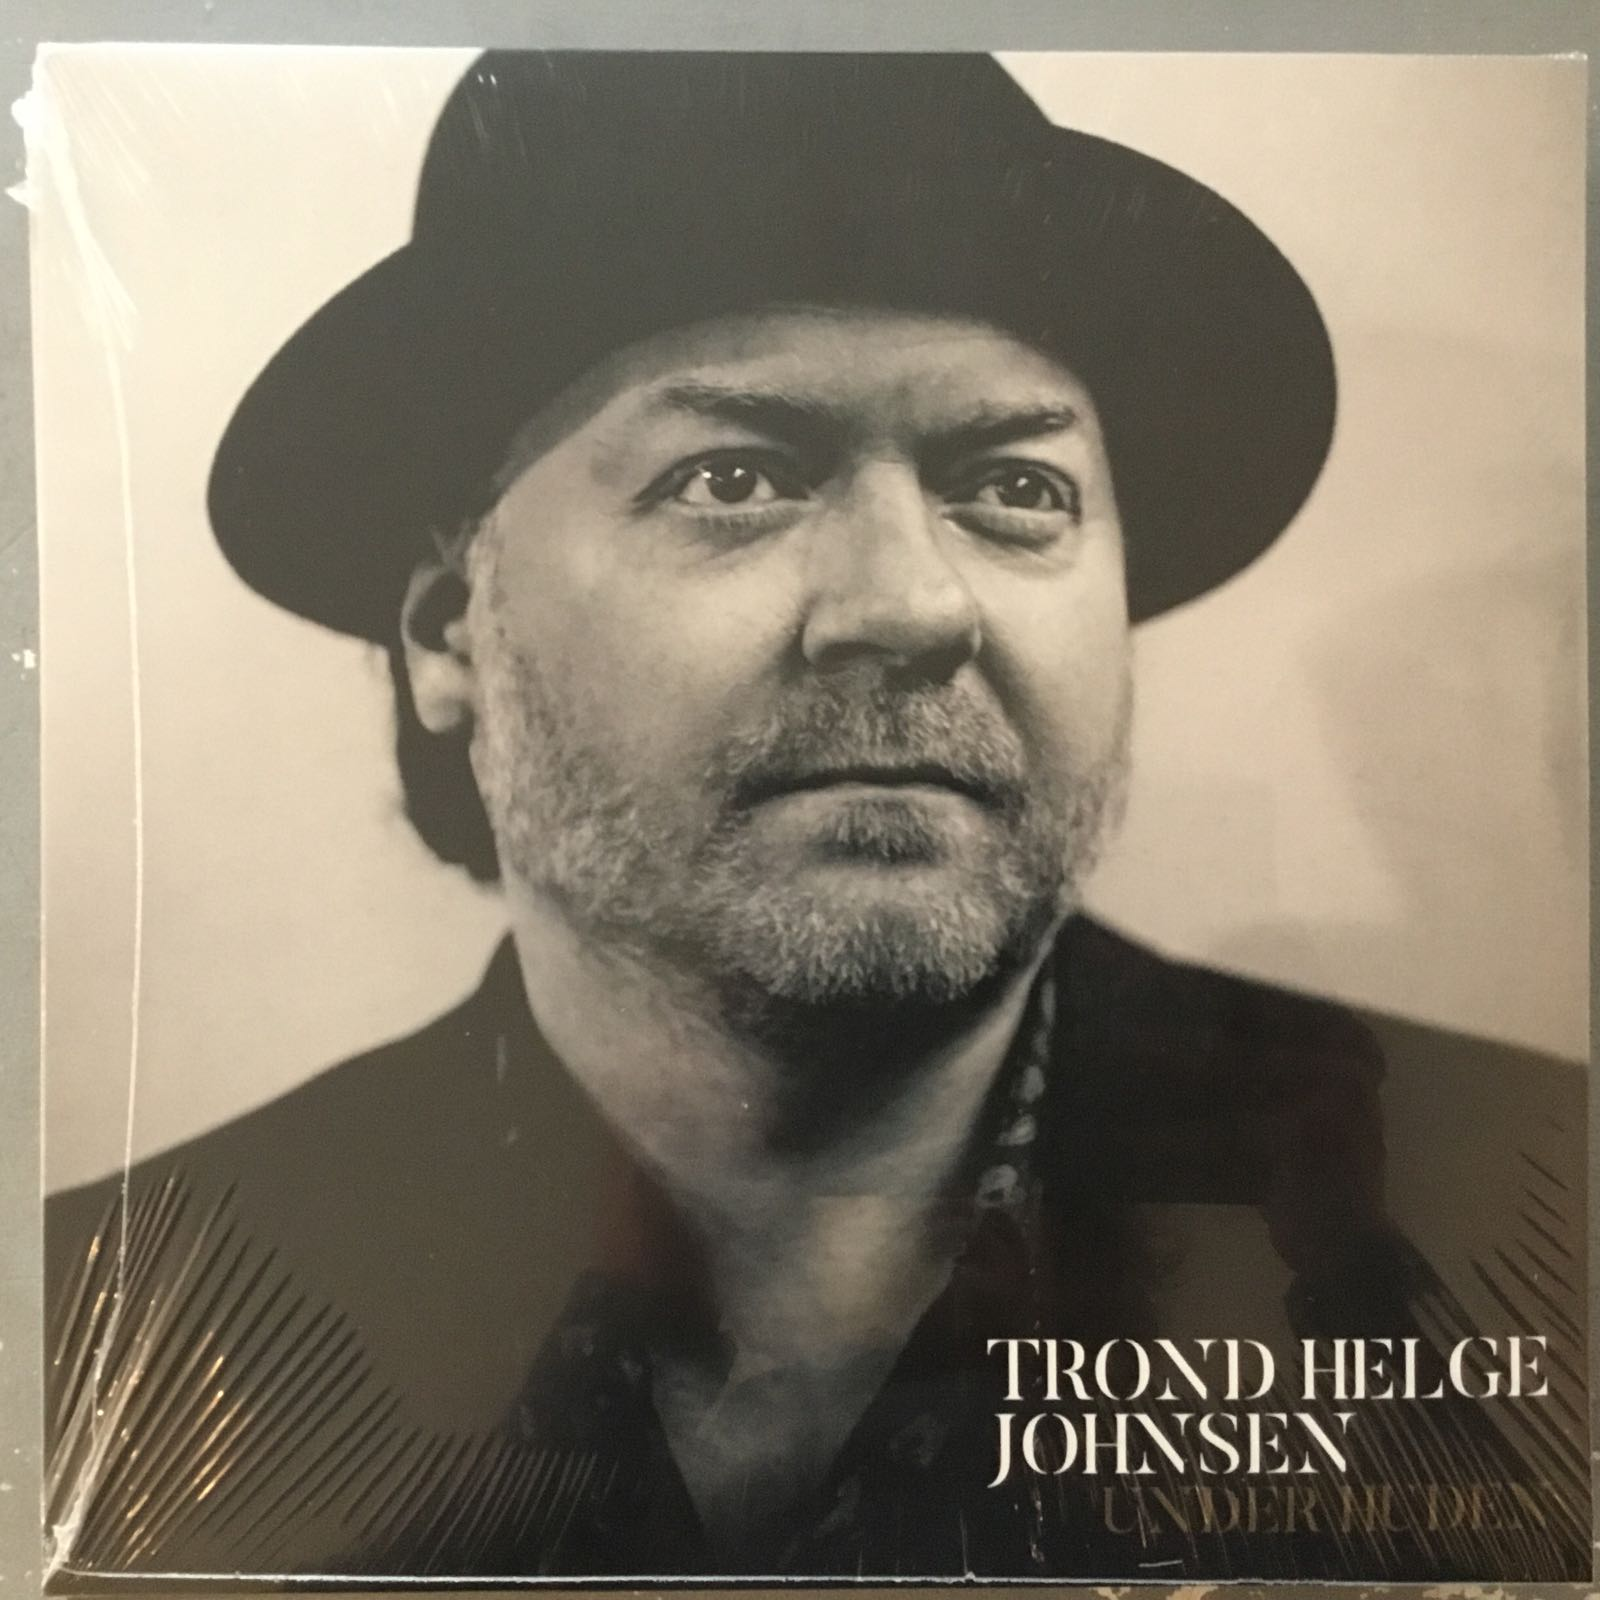 Trond Helge Johnsen - Under Huden [LP]